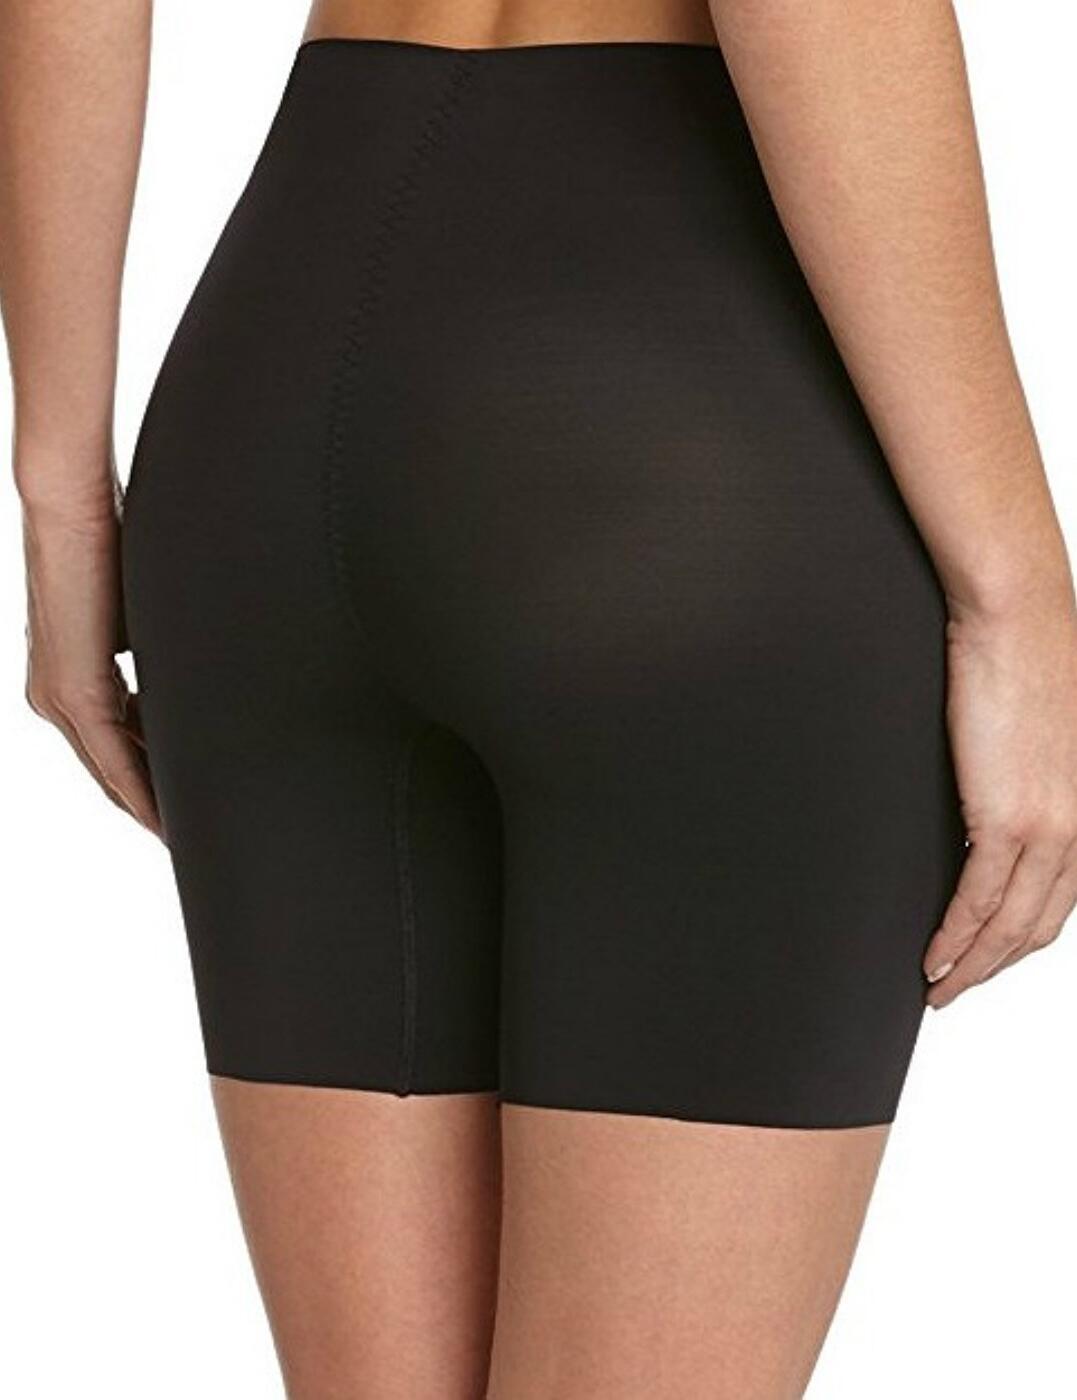 Wacoal-Beauty-Secret-Lift-Up-Shaping-Slimming-Panty-GRA541-Wacoal-Shapewear Indexbild 3